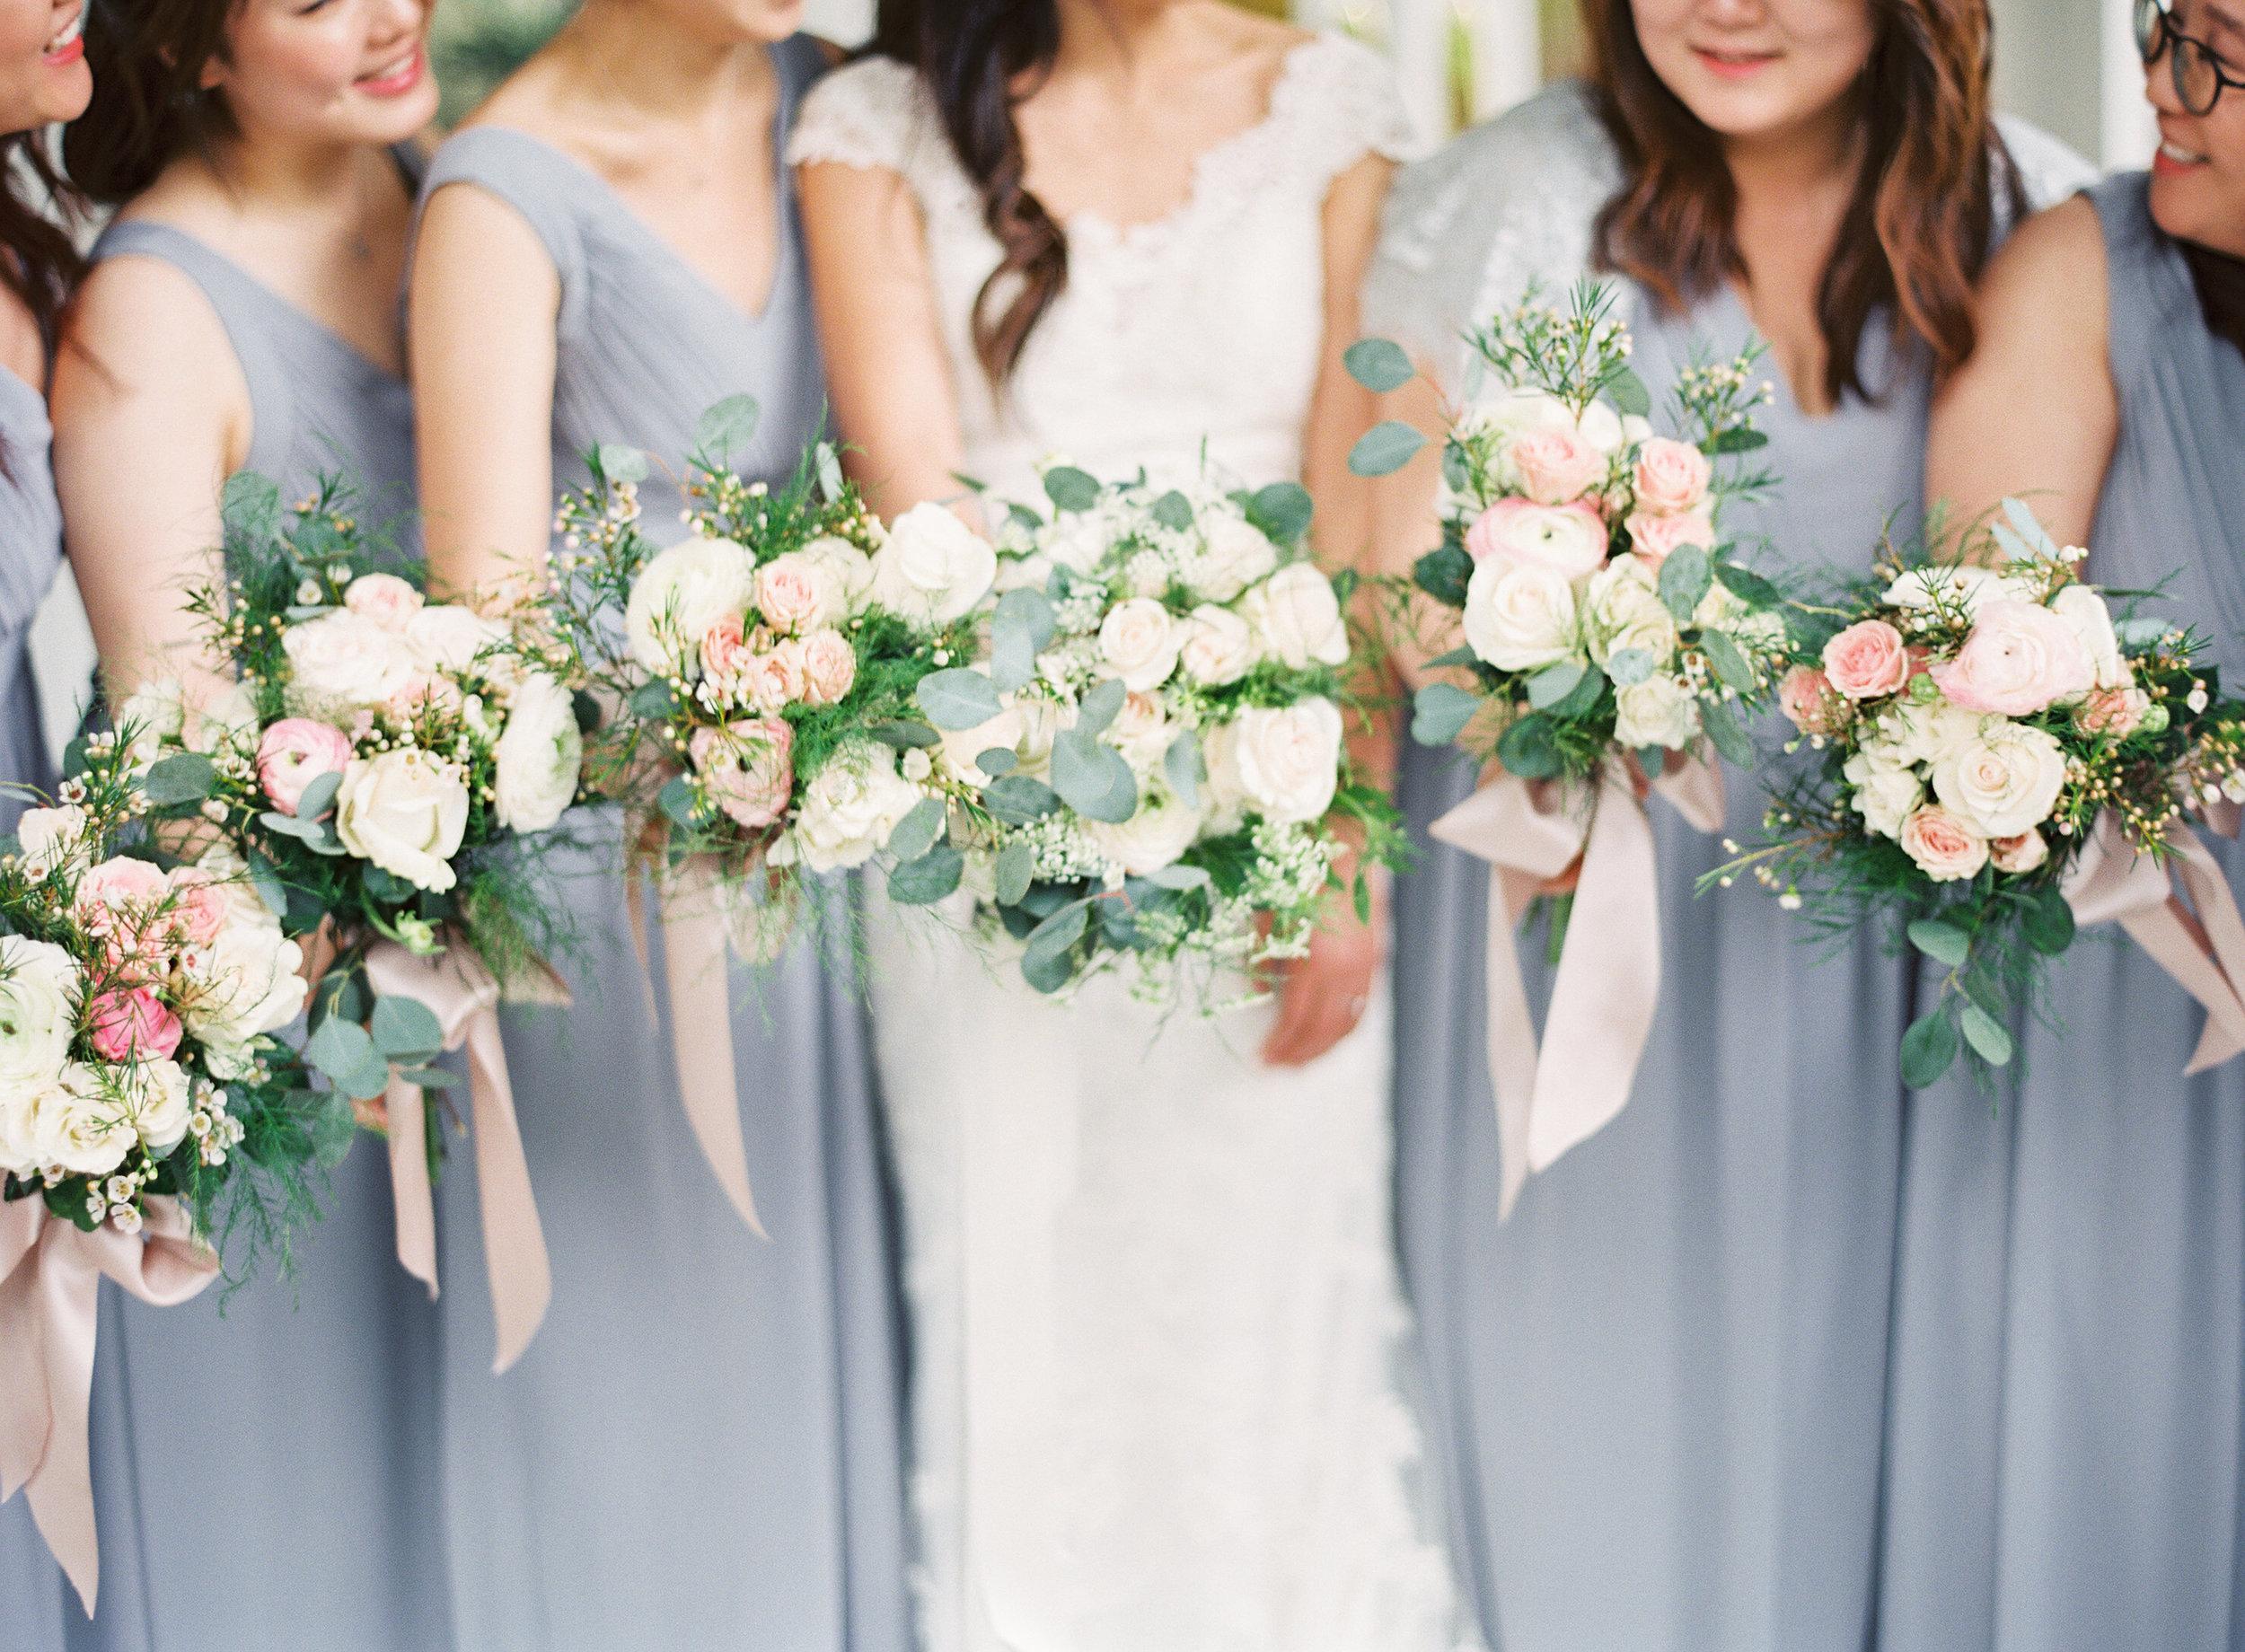 JA_Wedding_Jennifer_Bridesmaids_007.jpg